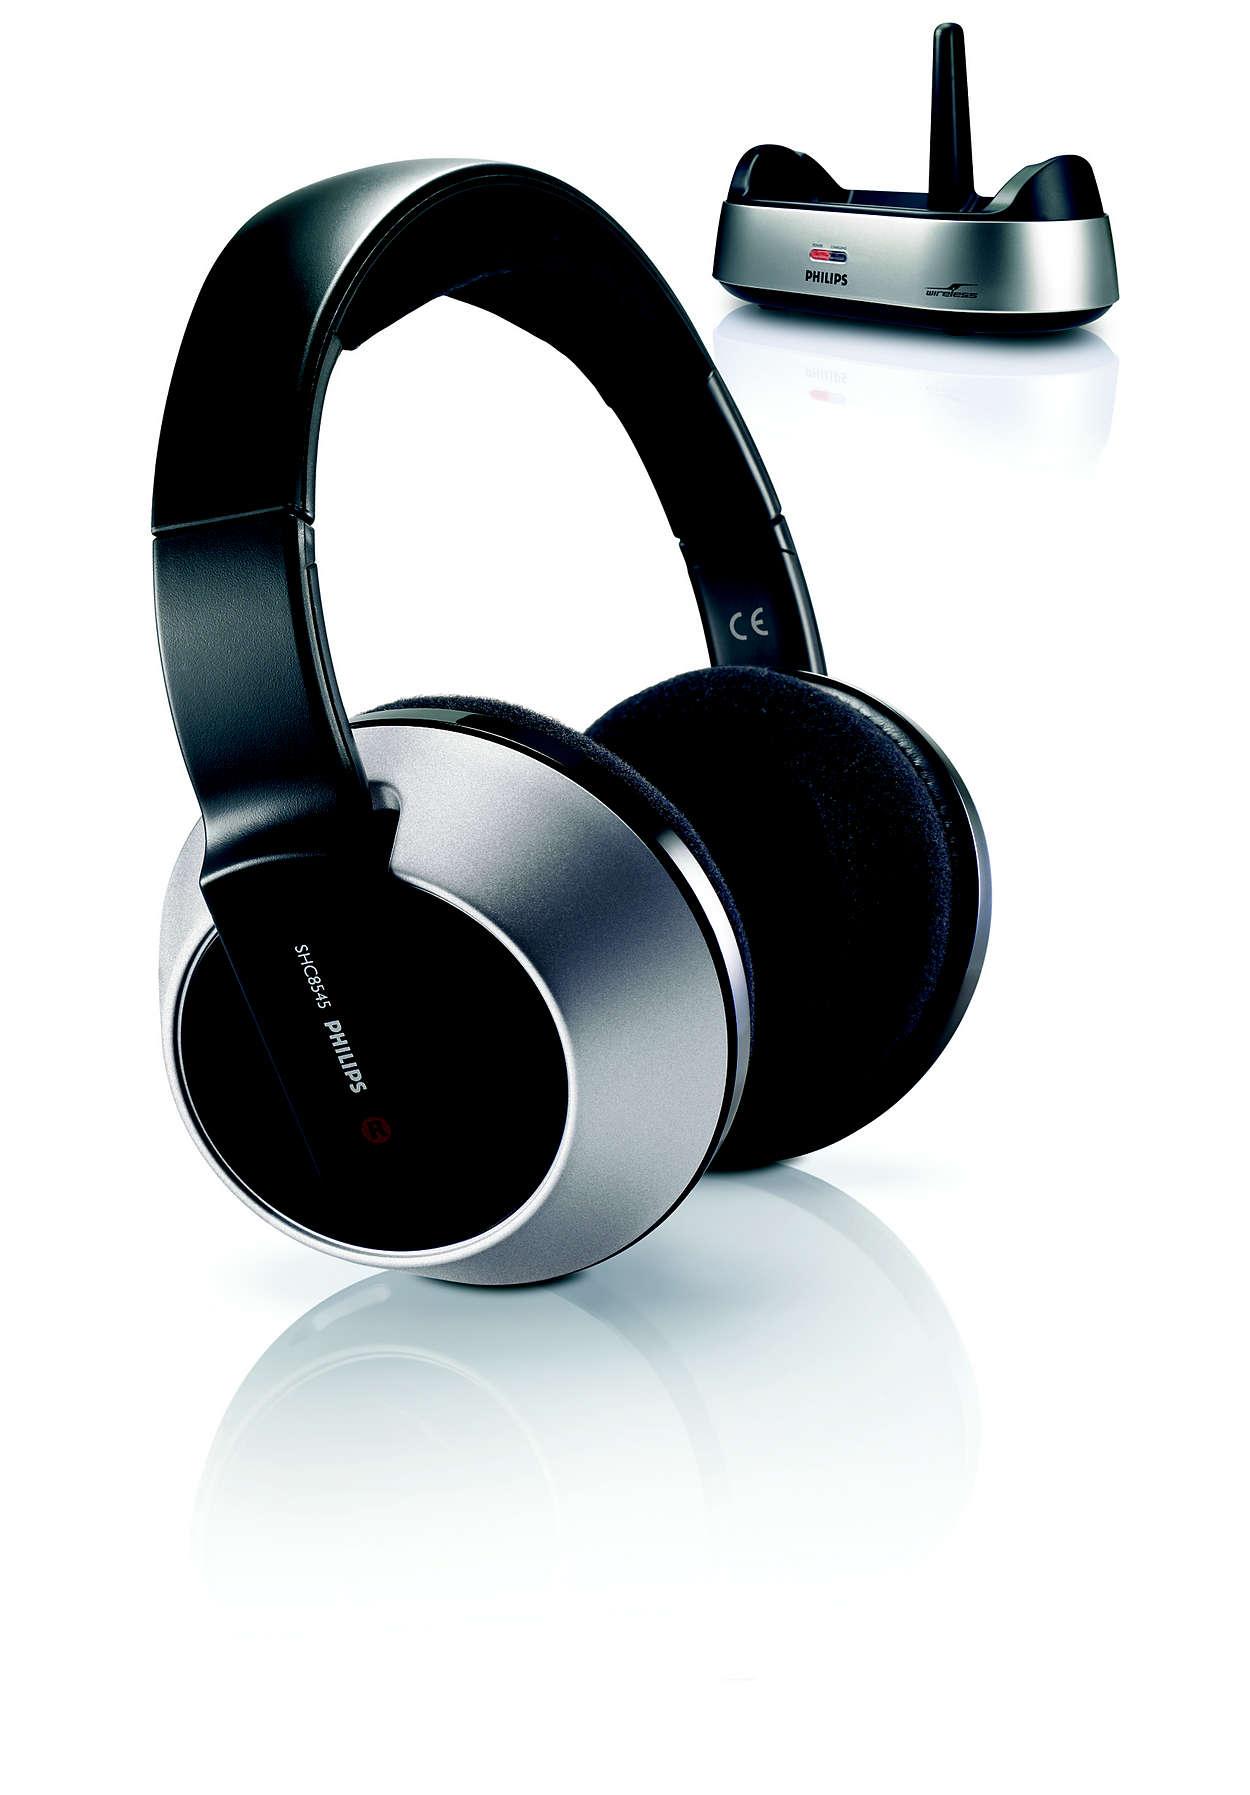 Superb wireless music